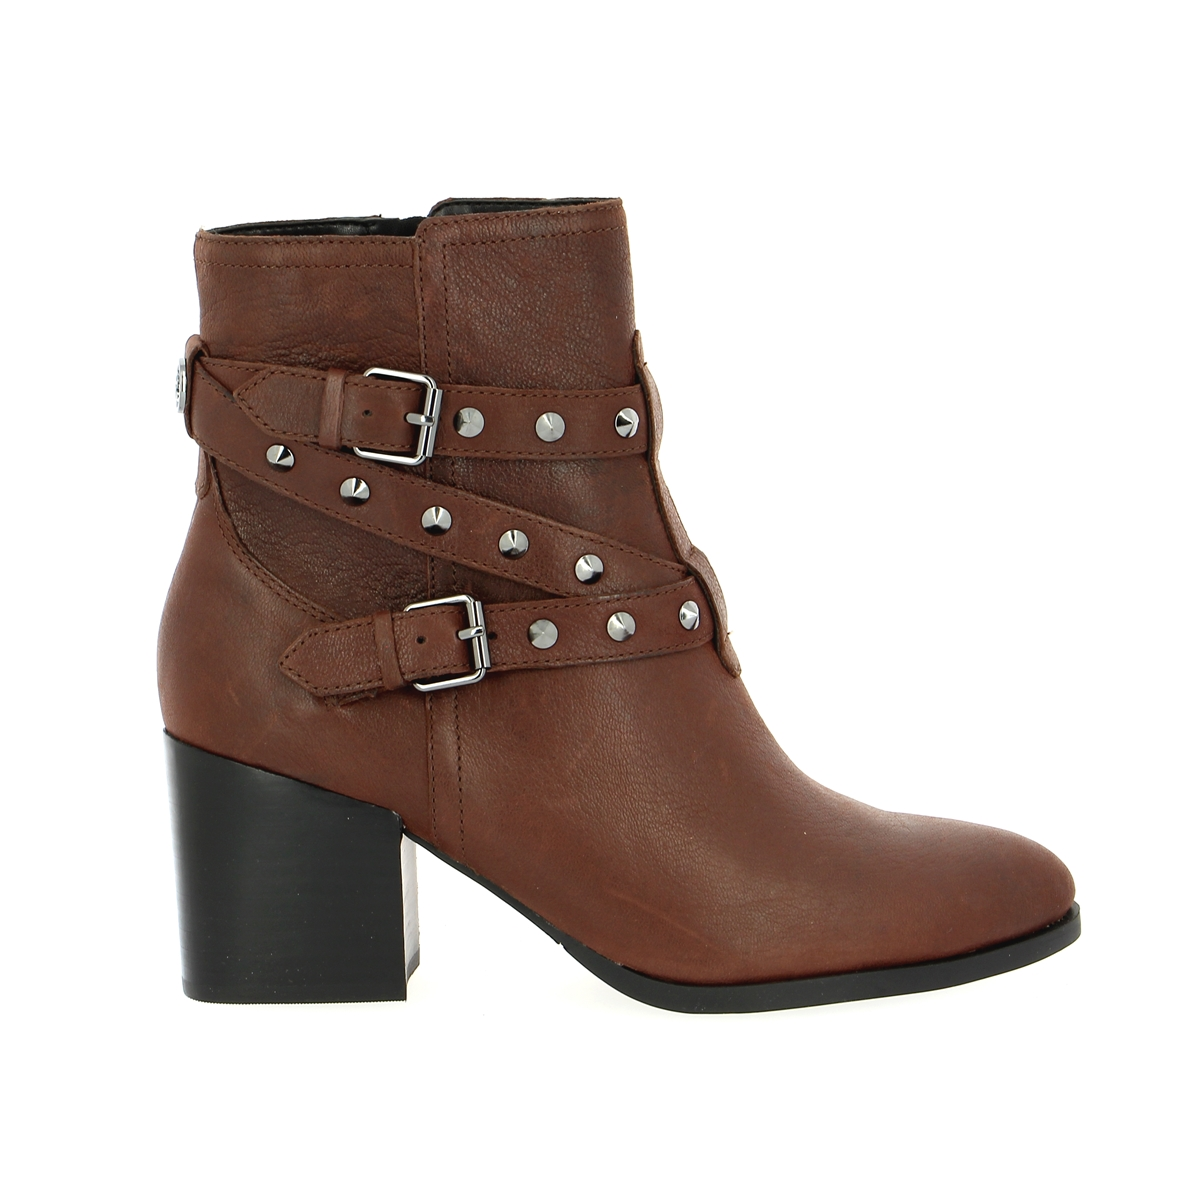 Guess Boots bruin